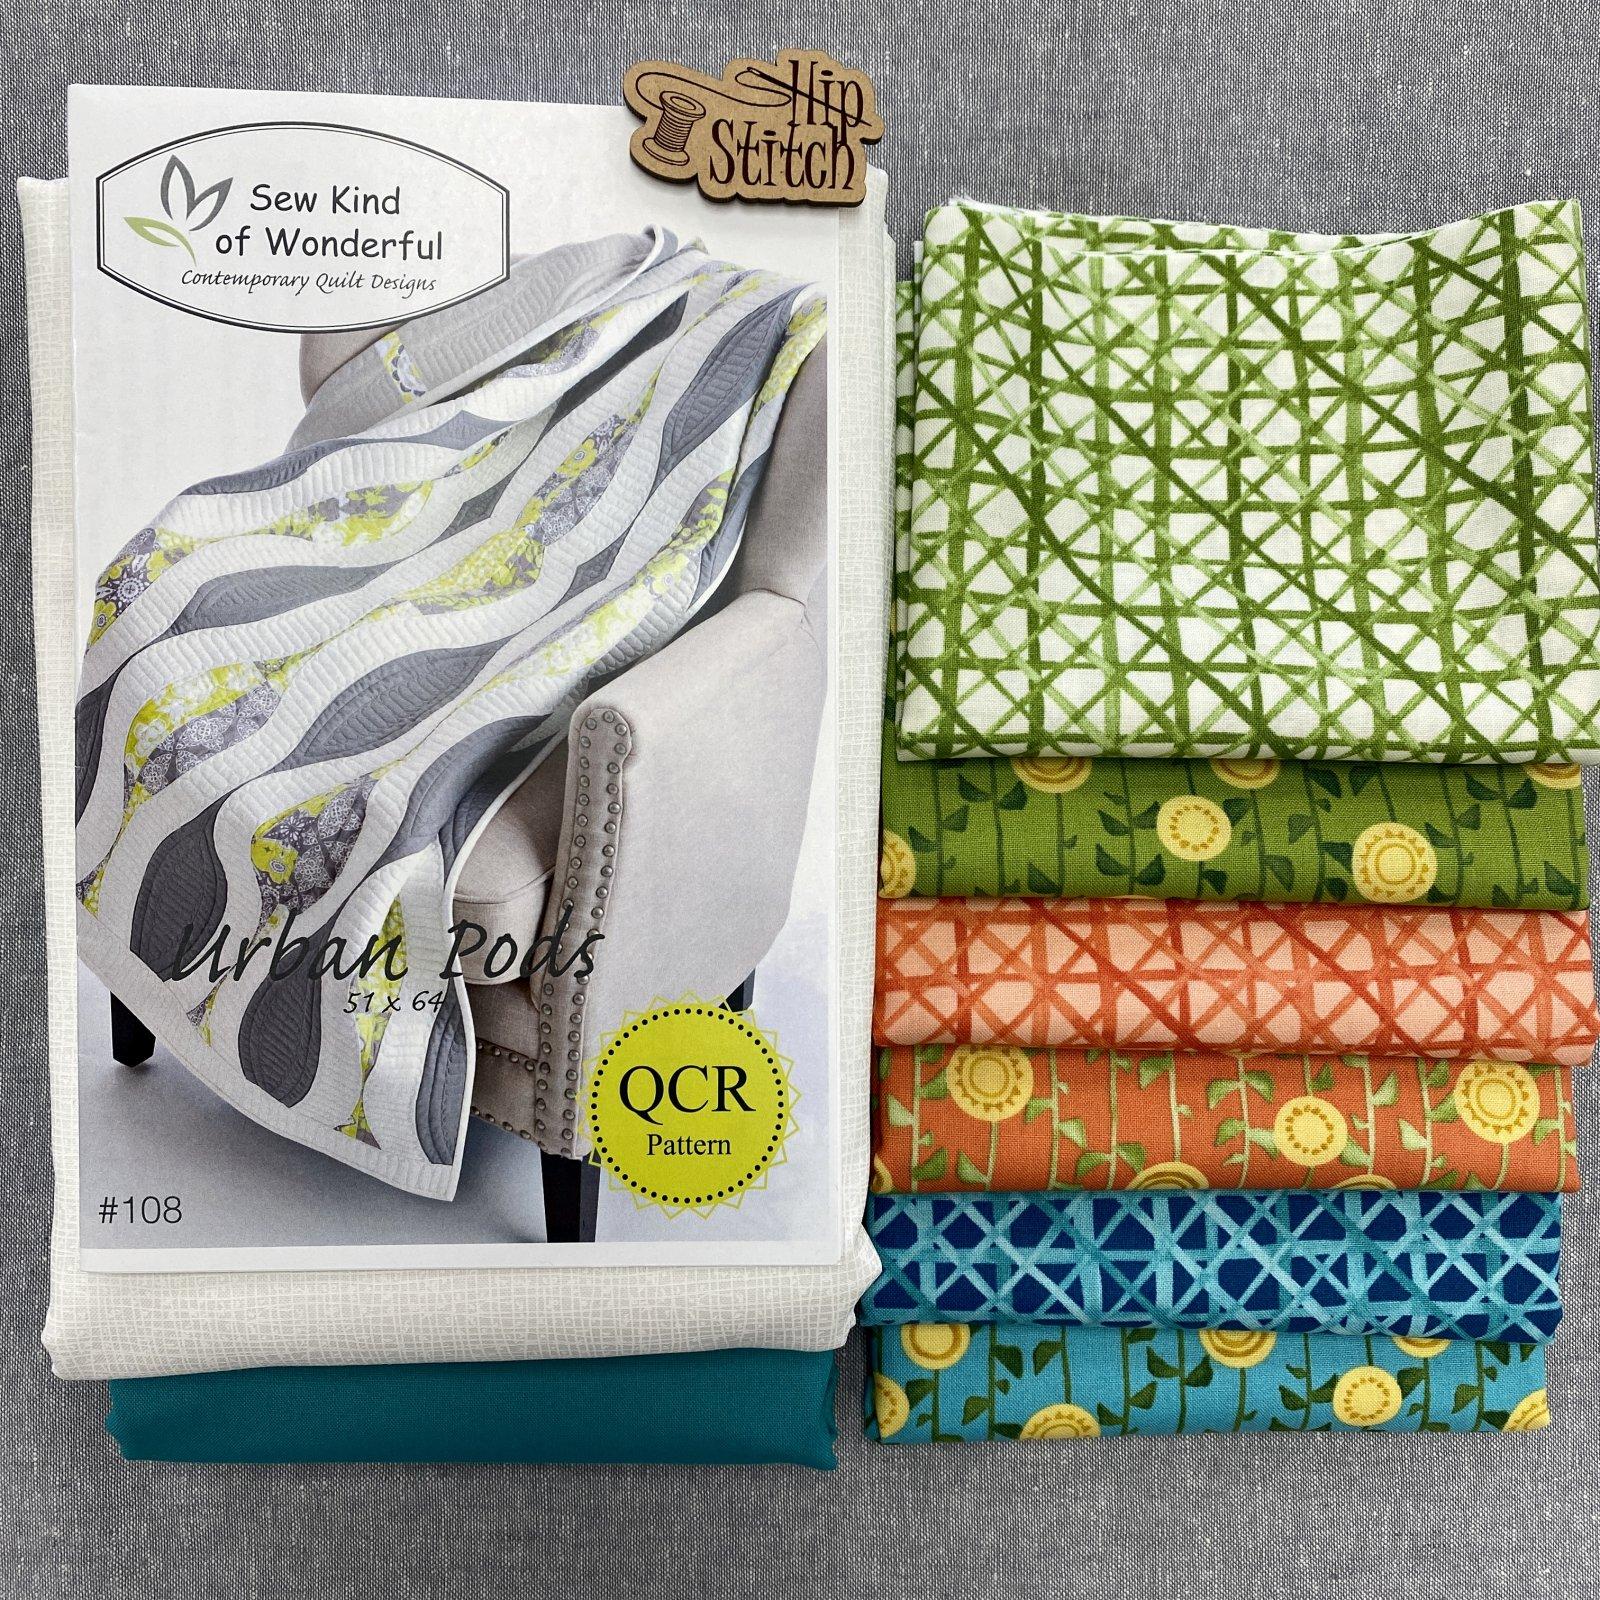 Urban Pod Quilt Kit